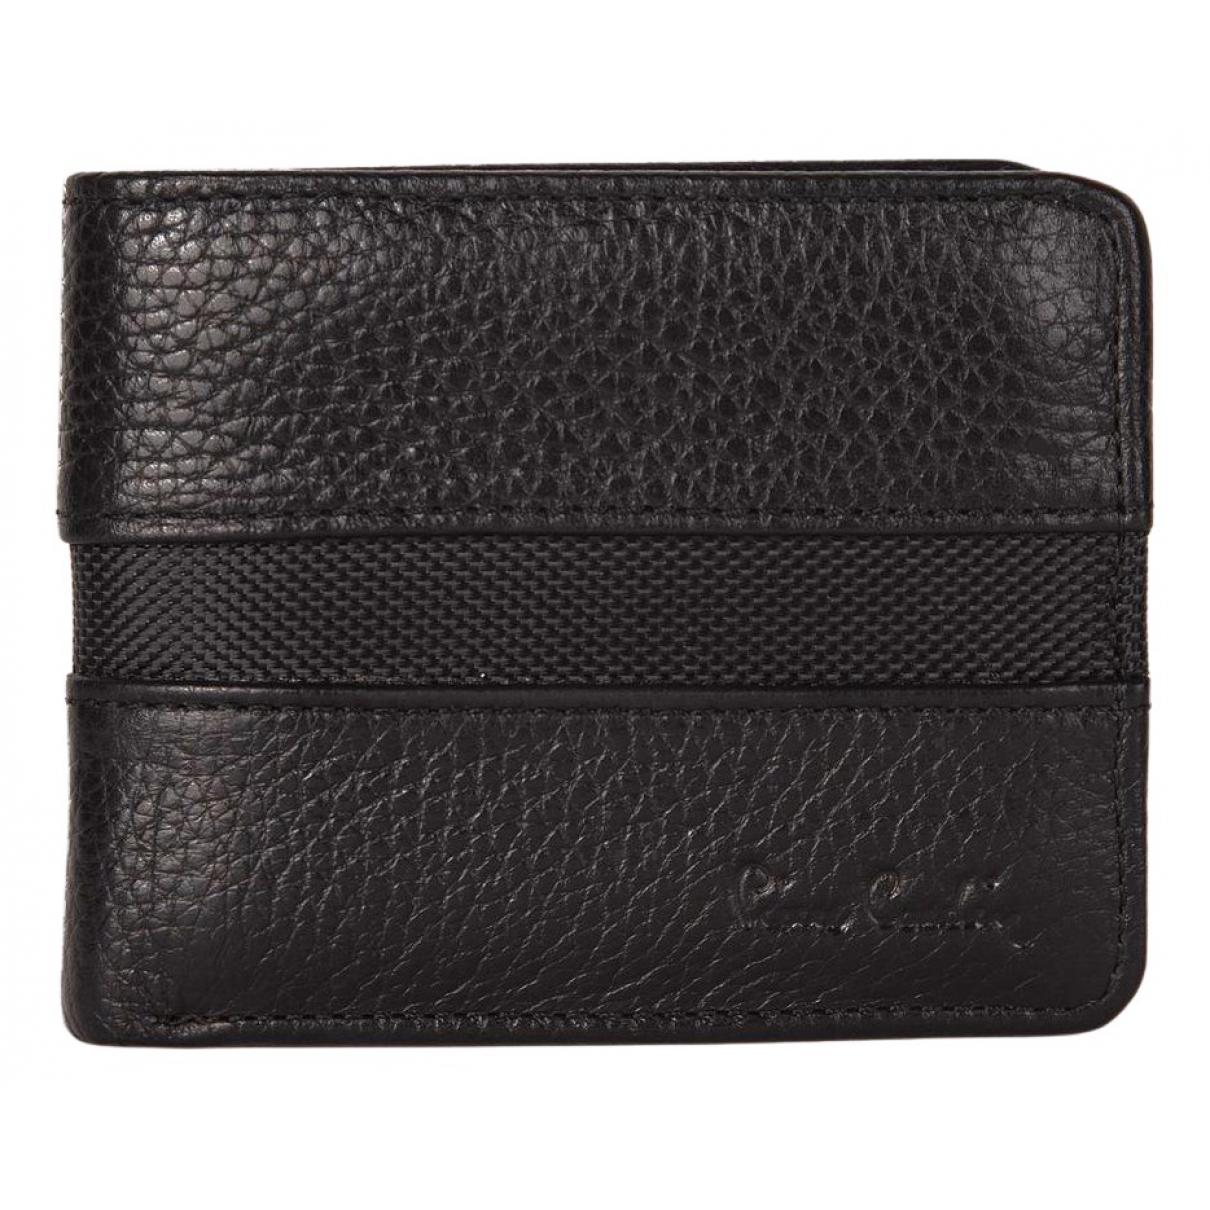 Pierre Cardin N Black Leather Small bag, wallet & cases for Men N